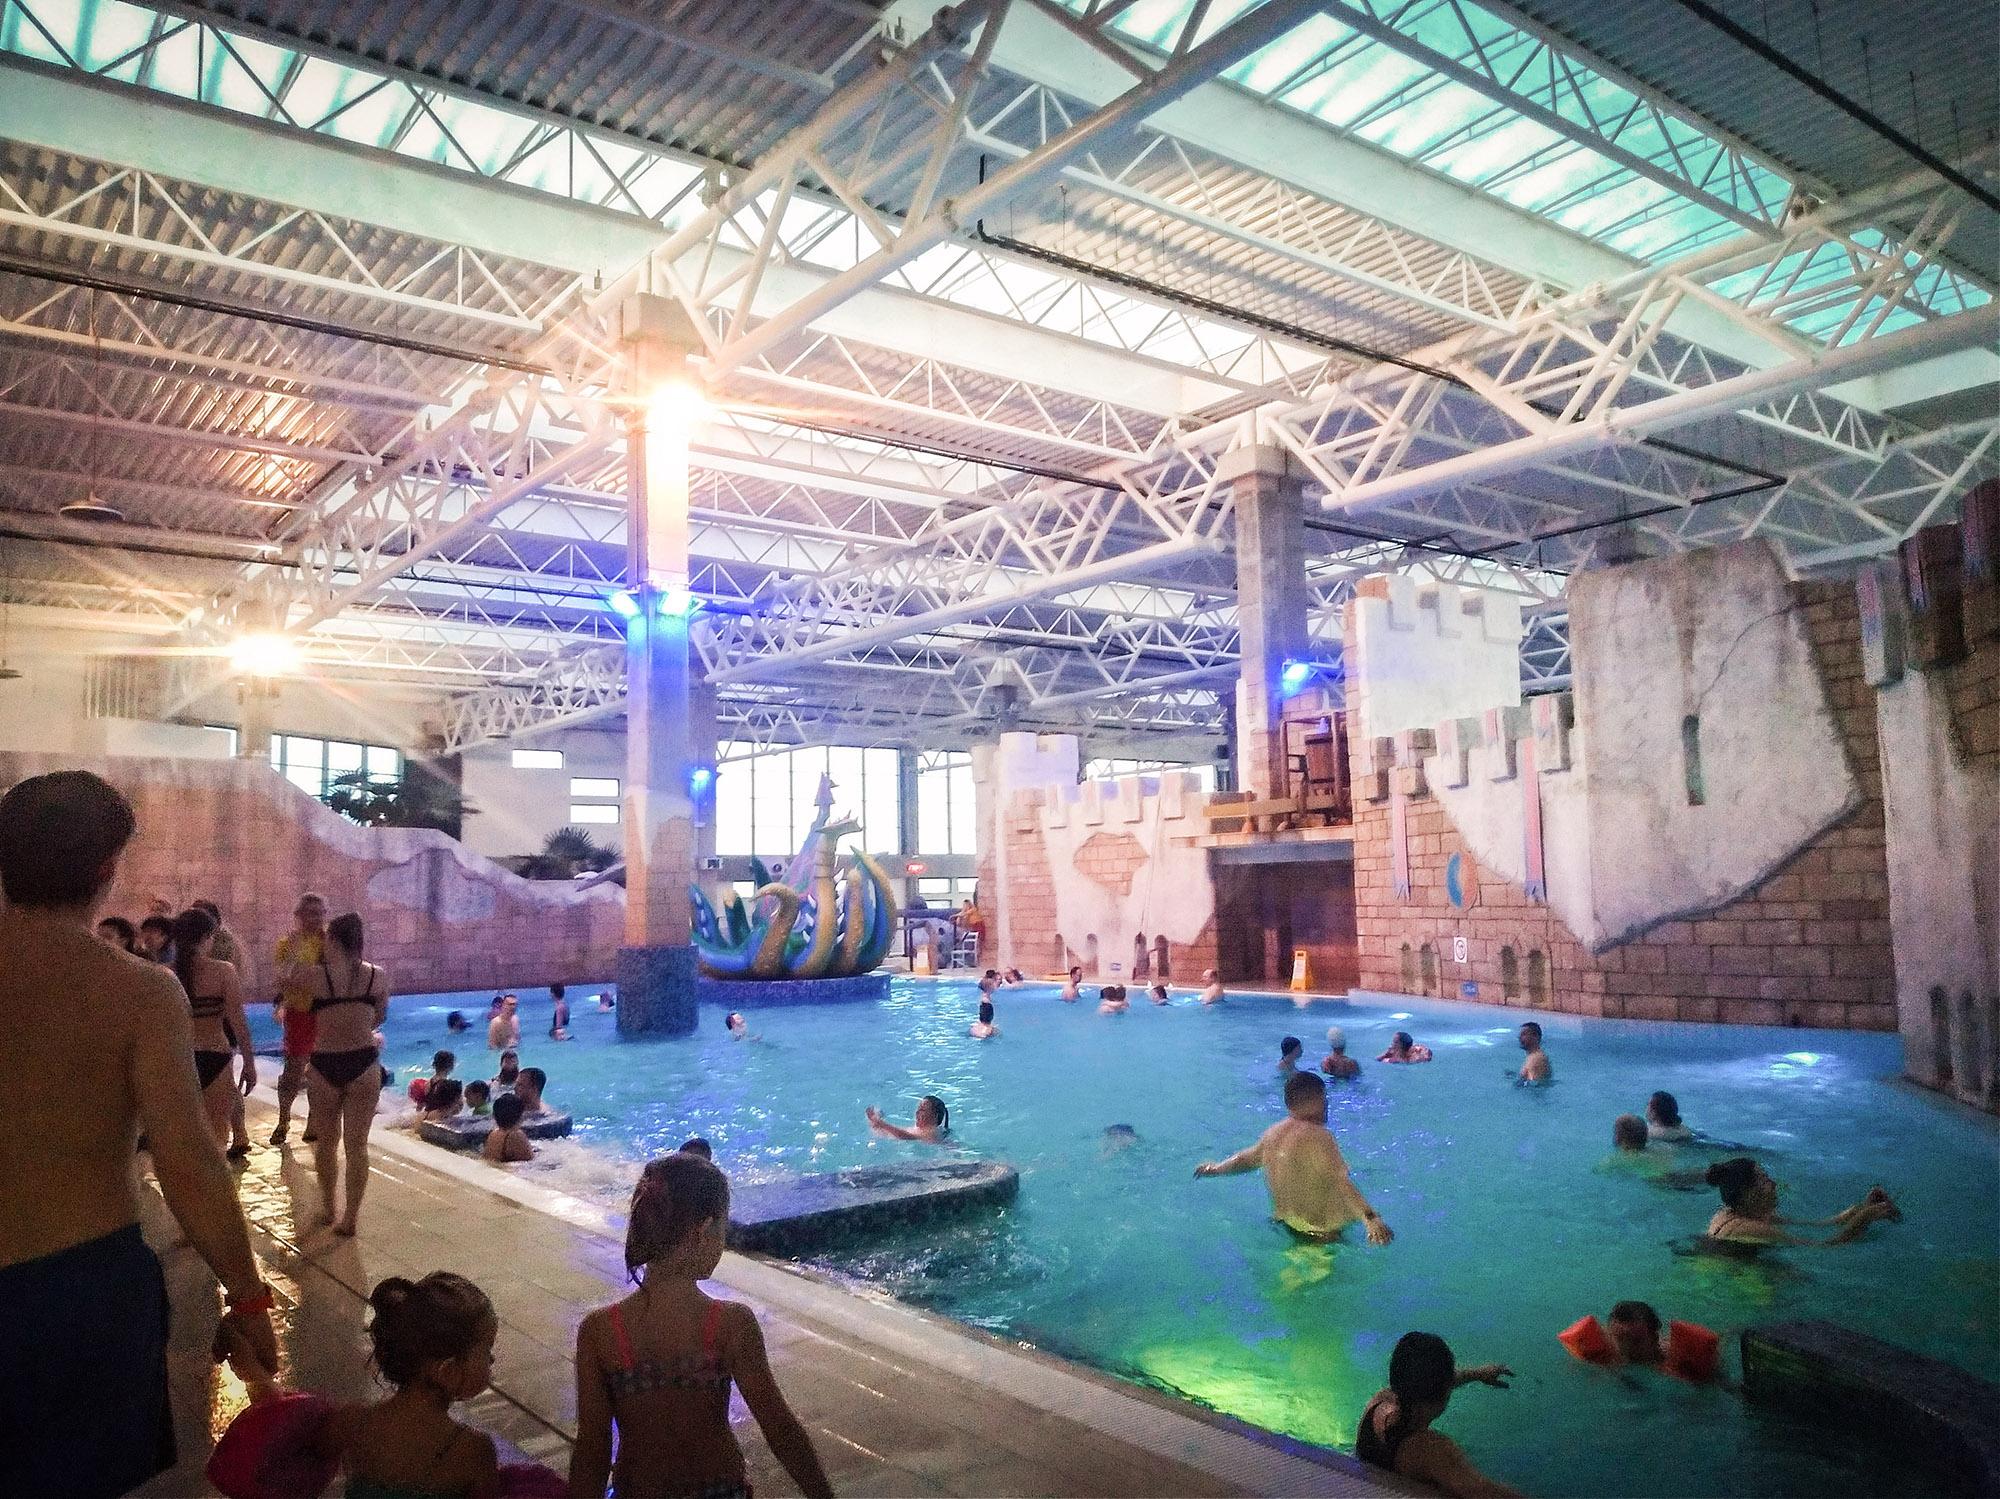 aquapark reda, aquapark w redzie, aquapark trójmiasto, basen dla dzieci, atrakcje dla dzieci trójmiasto